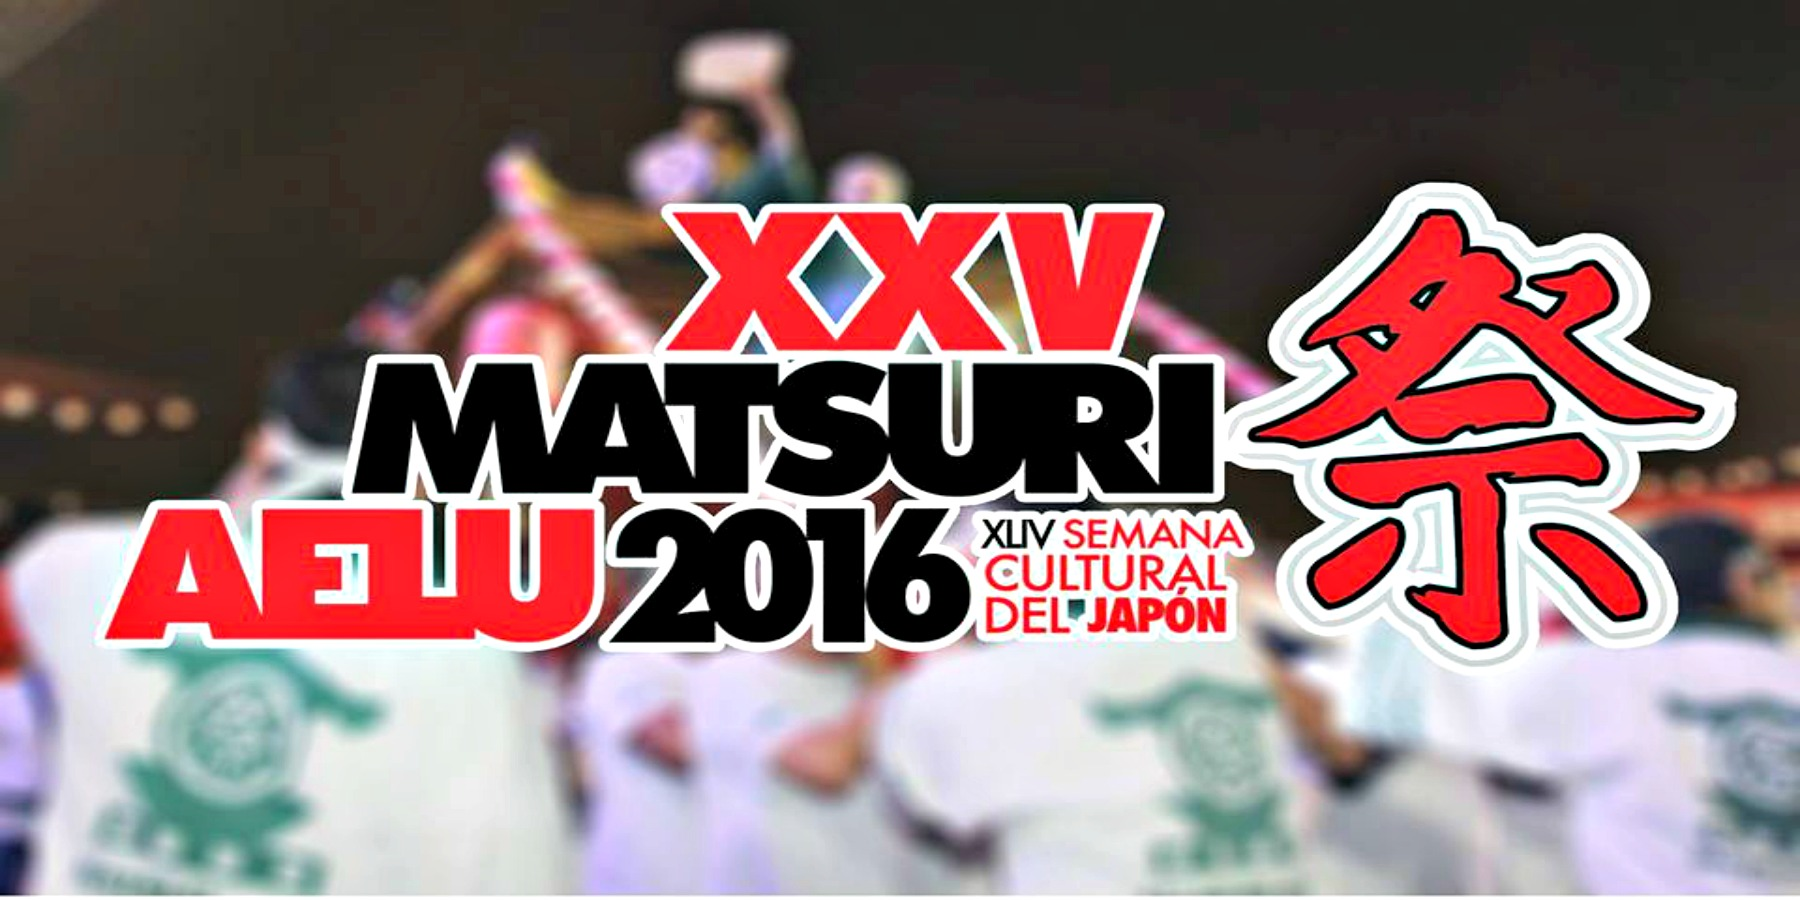 Matsuri AELU 2016